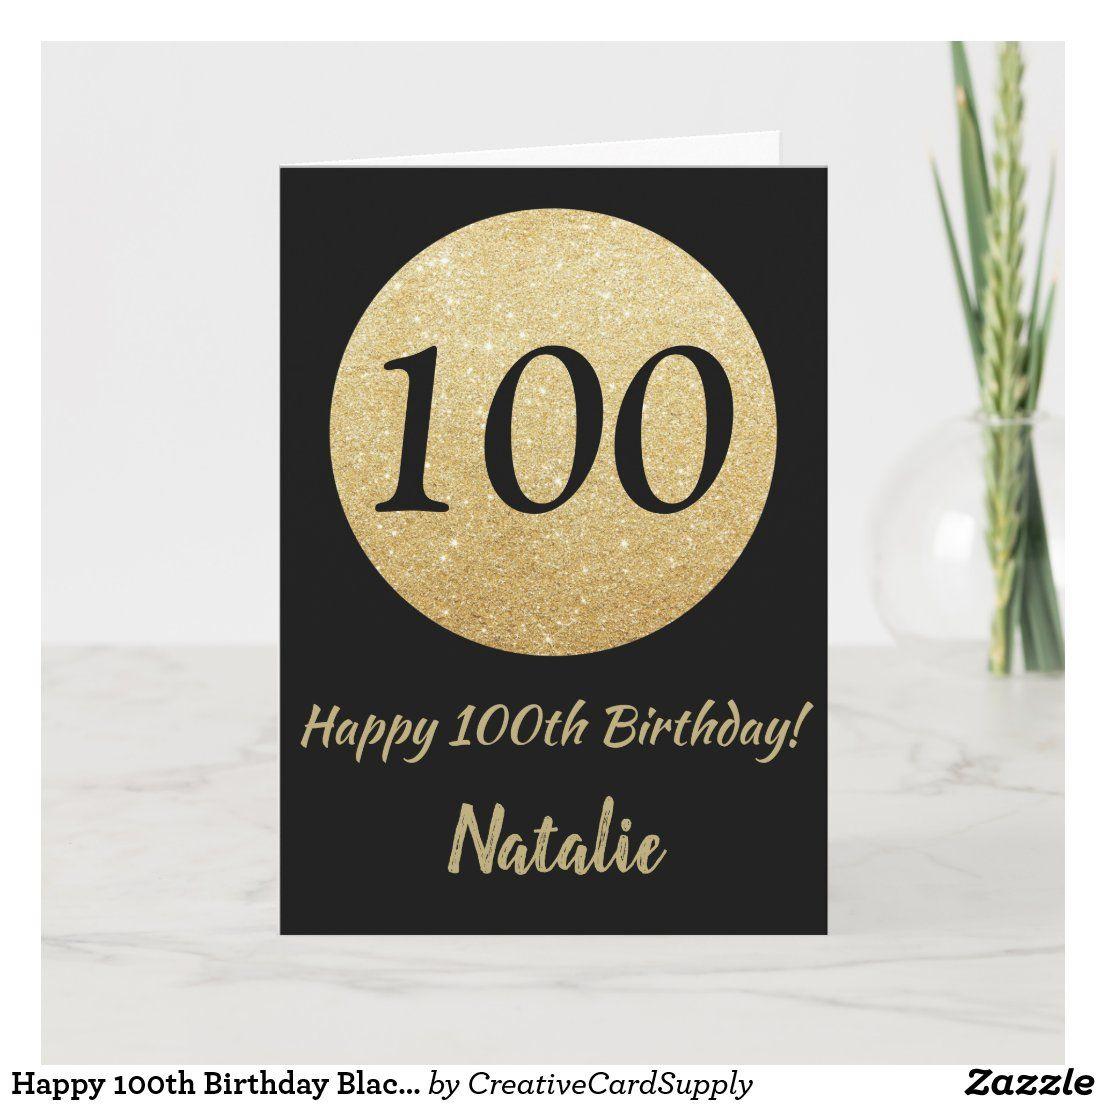 Happy 100th Birthday Black And Gold Glitter Card Zazzle Com Happy 100th Birthday Glitter Cards Happy 10th Birthday